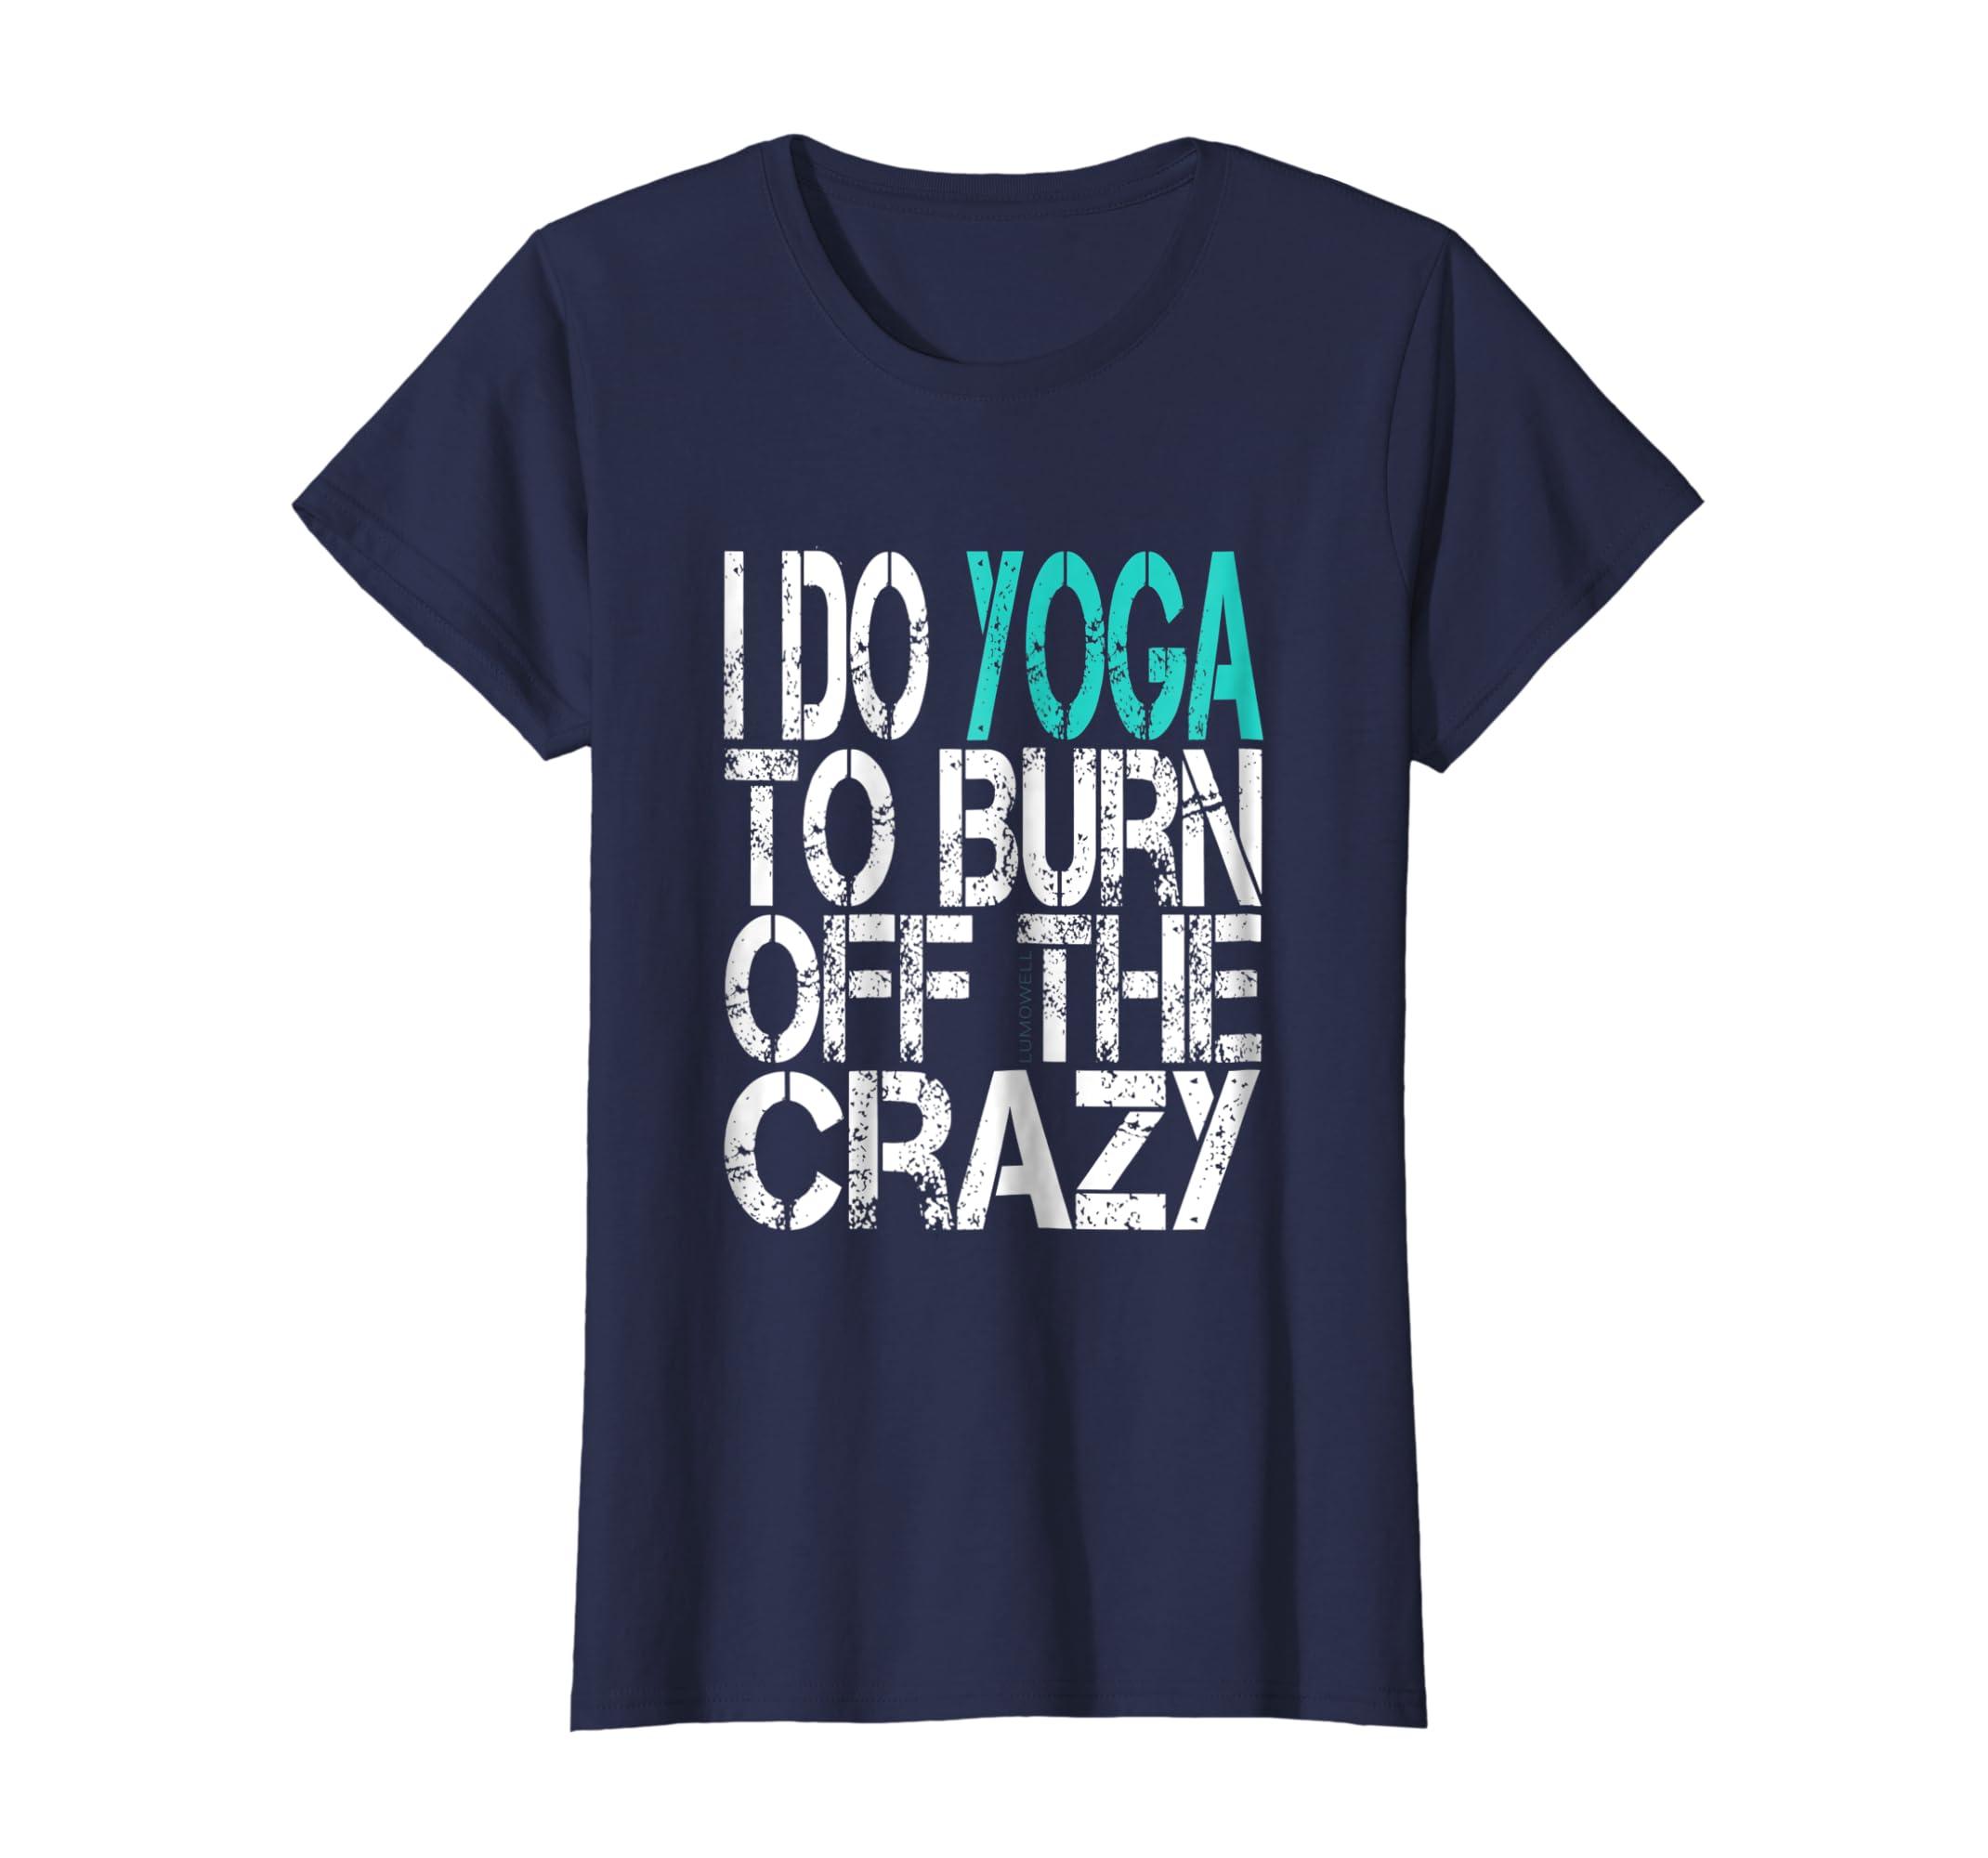 59c959fe Amazon.com: I Do Yoga To Burn Off The Crazy Shirt - Funny Yoga T Shirt:  Clothing